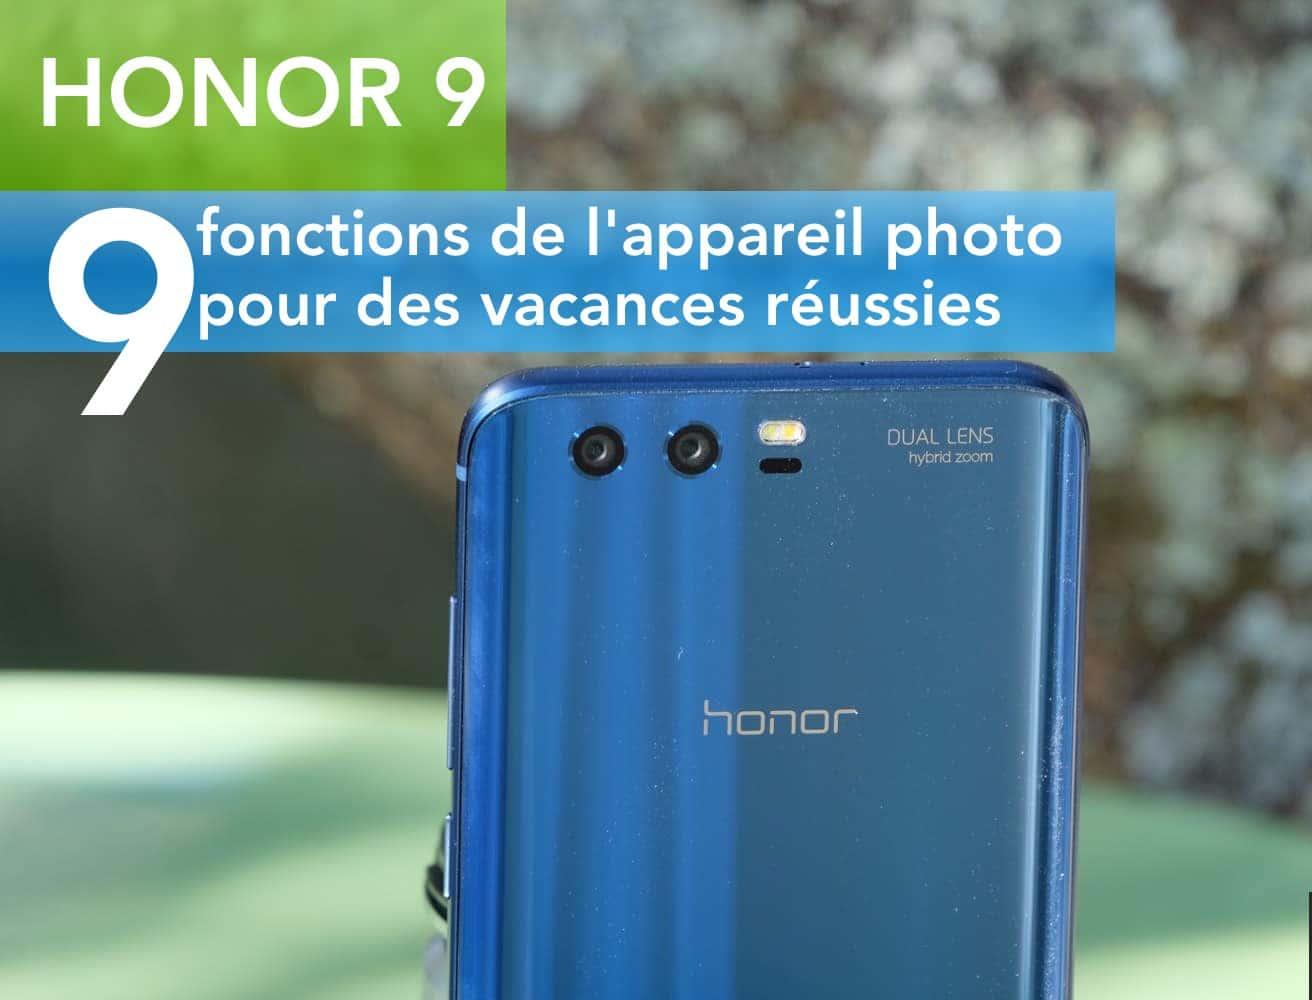 honor 9 appareil photo vacances